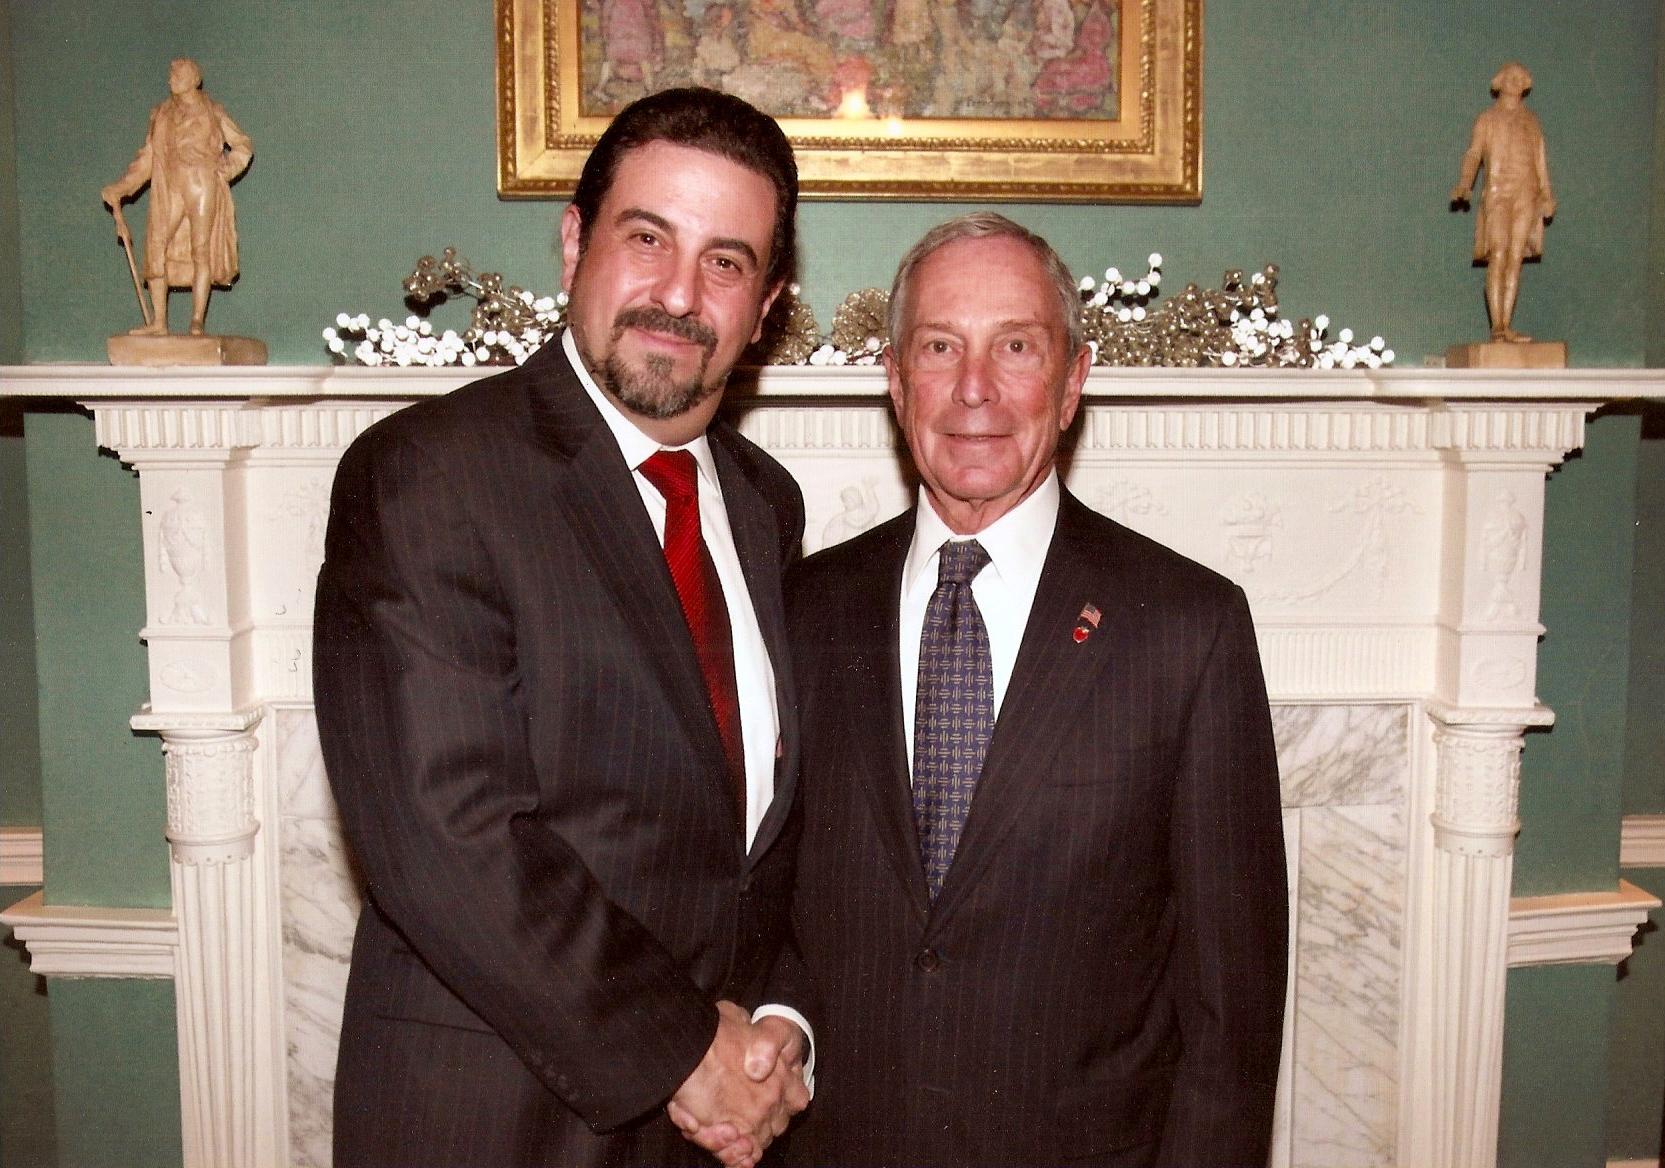 With NYC MayorMichael Bloomberg